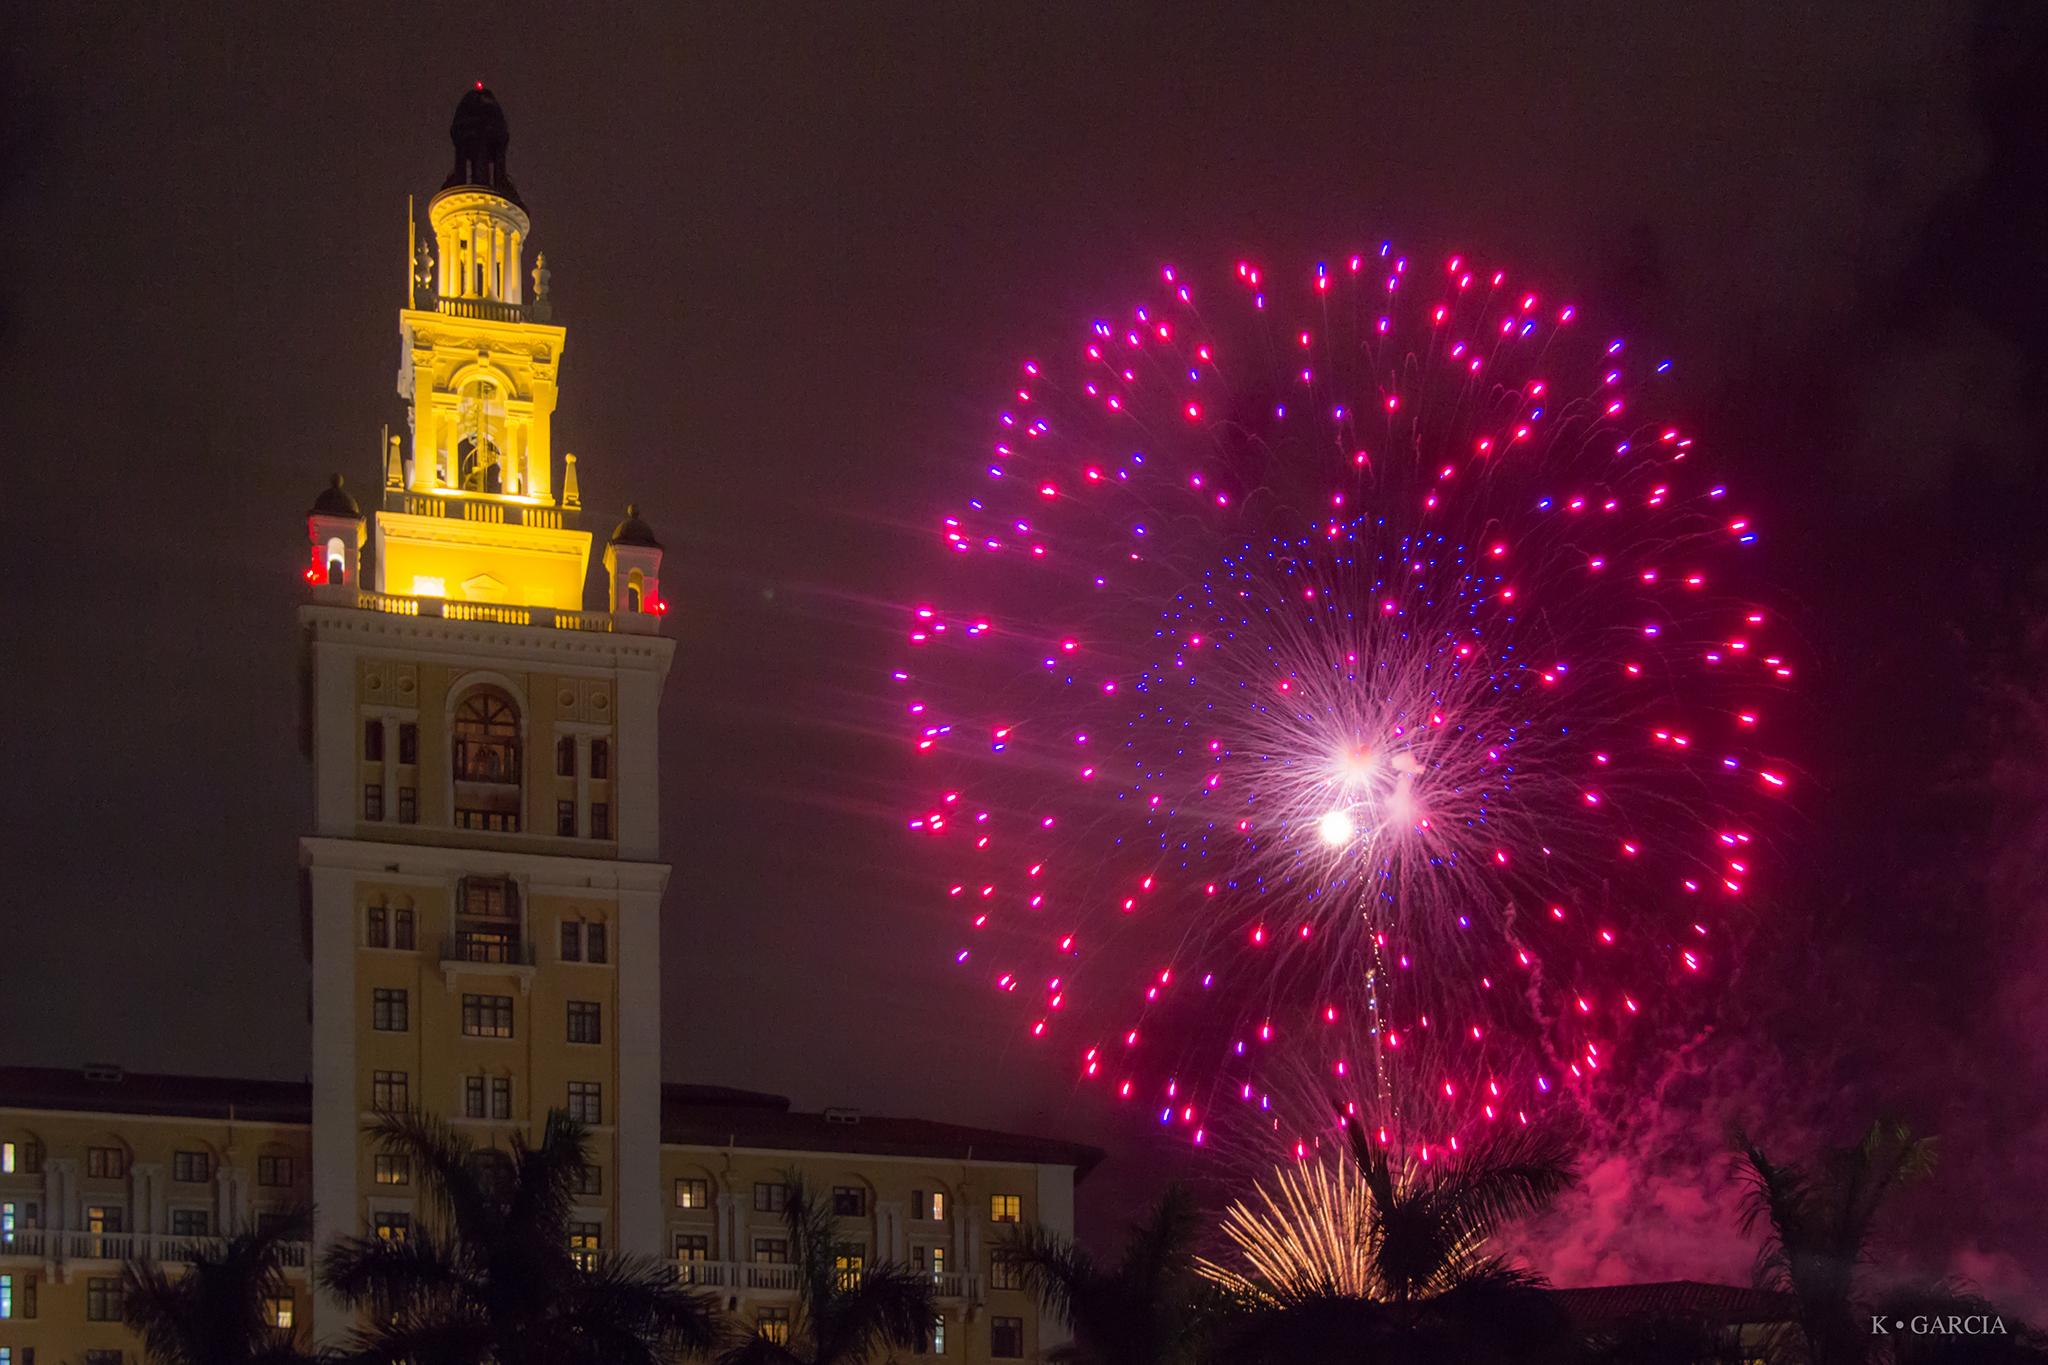 Fireworks at Biltmore Hotel